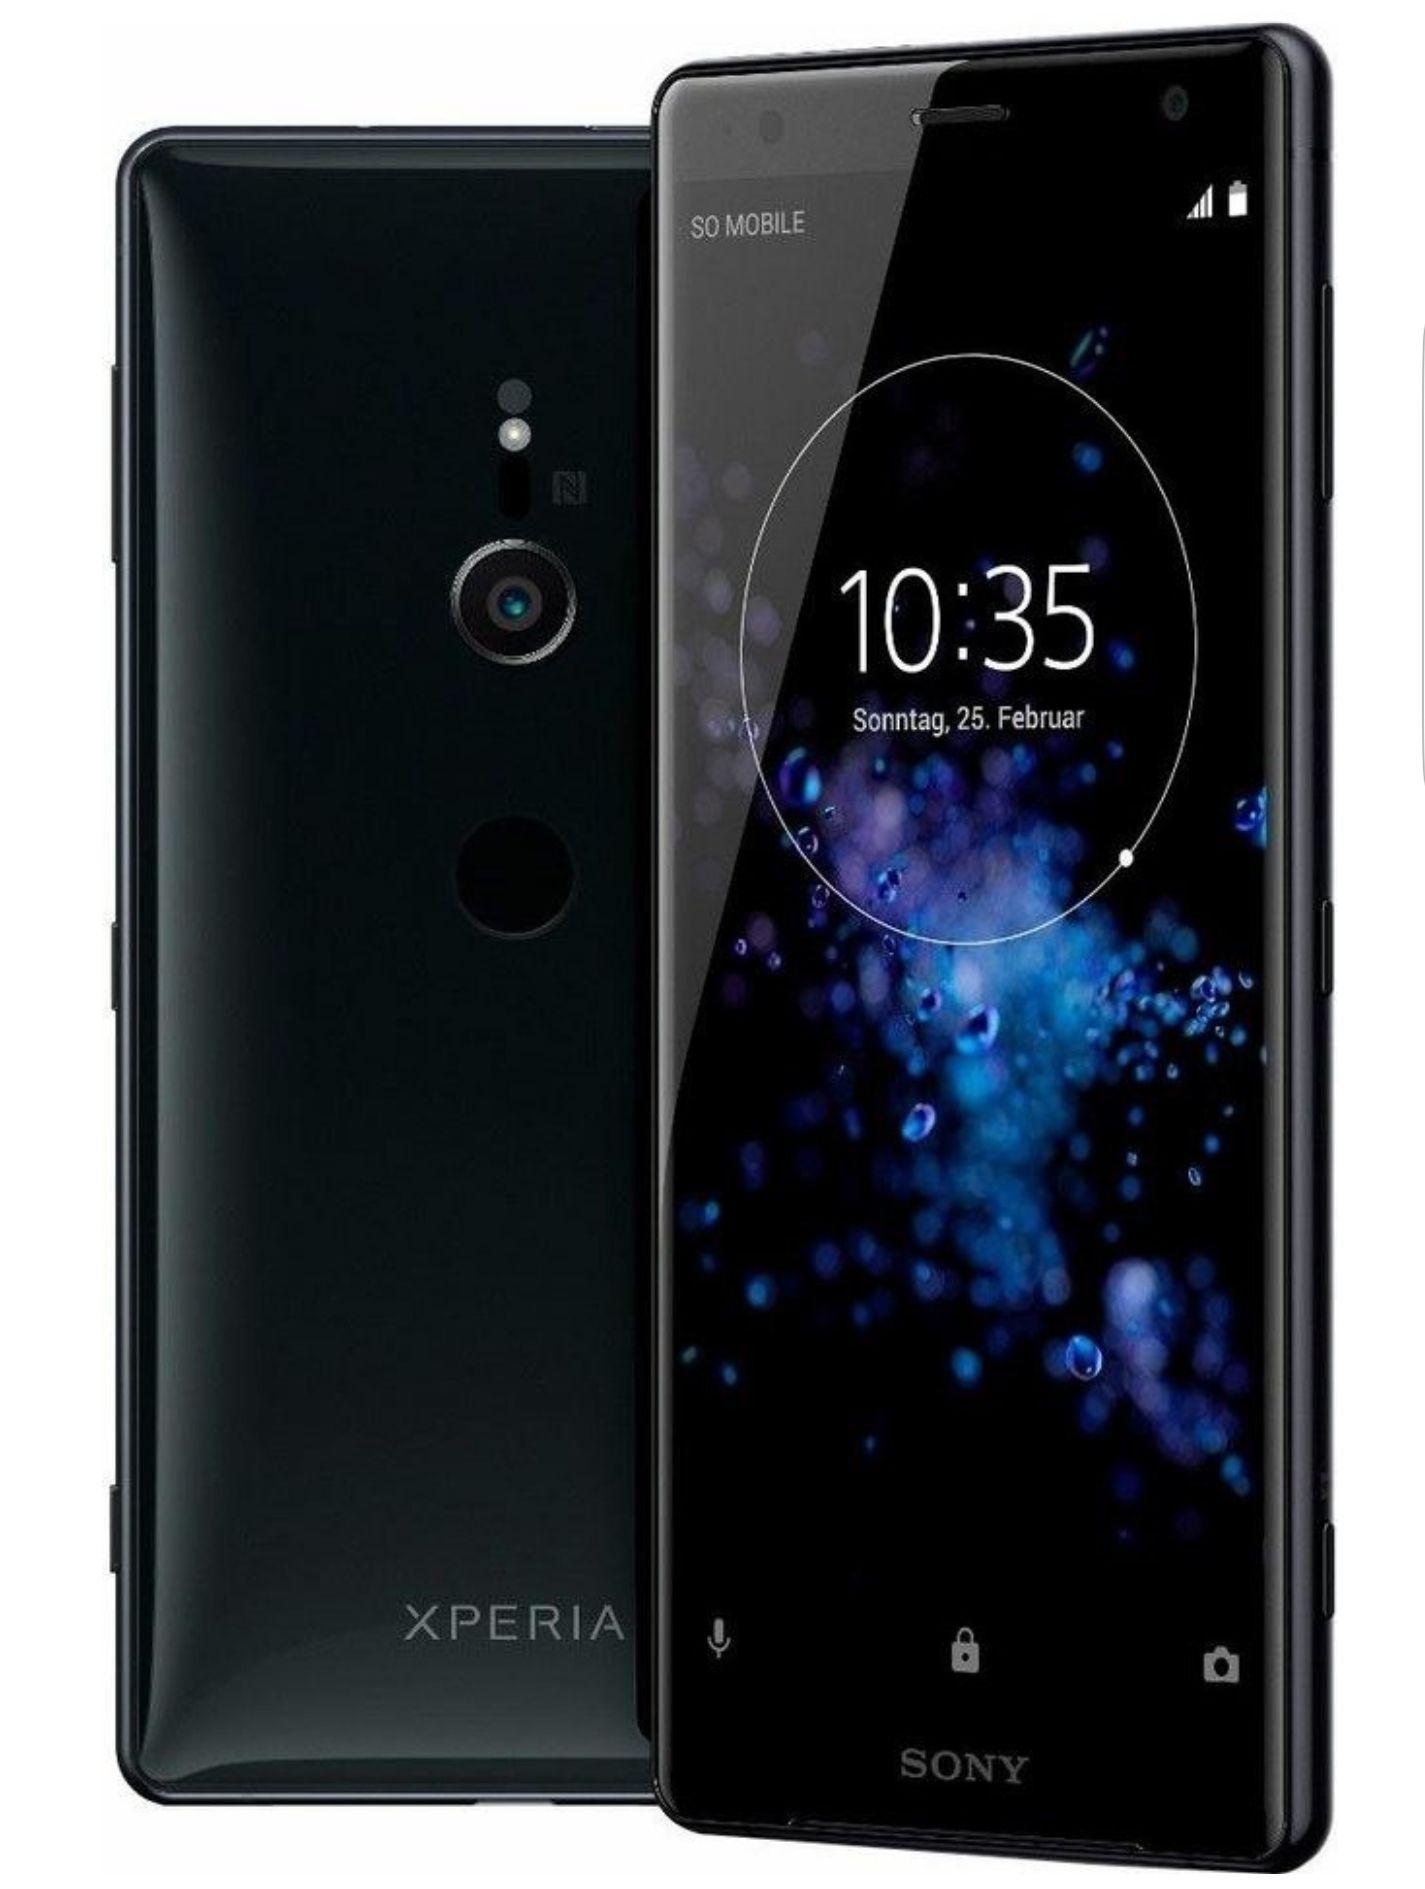 Sony Xperia XZ2 Single Sim Liquid Black / silver (Clevertronic)